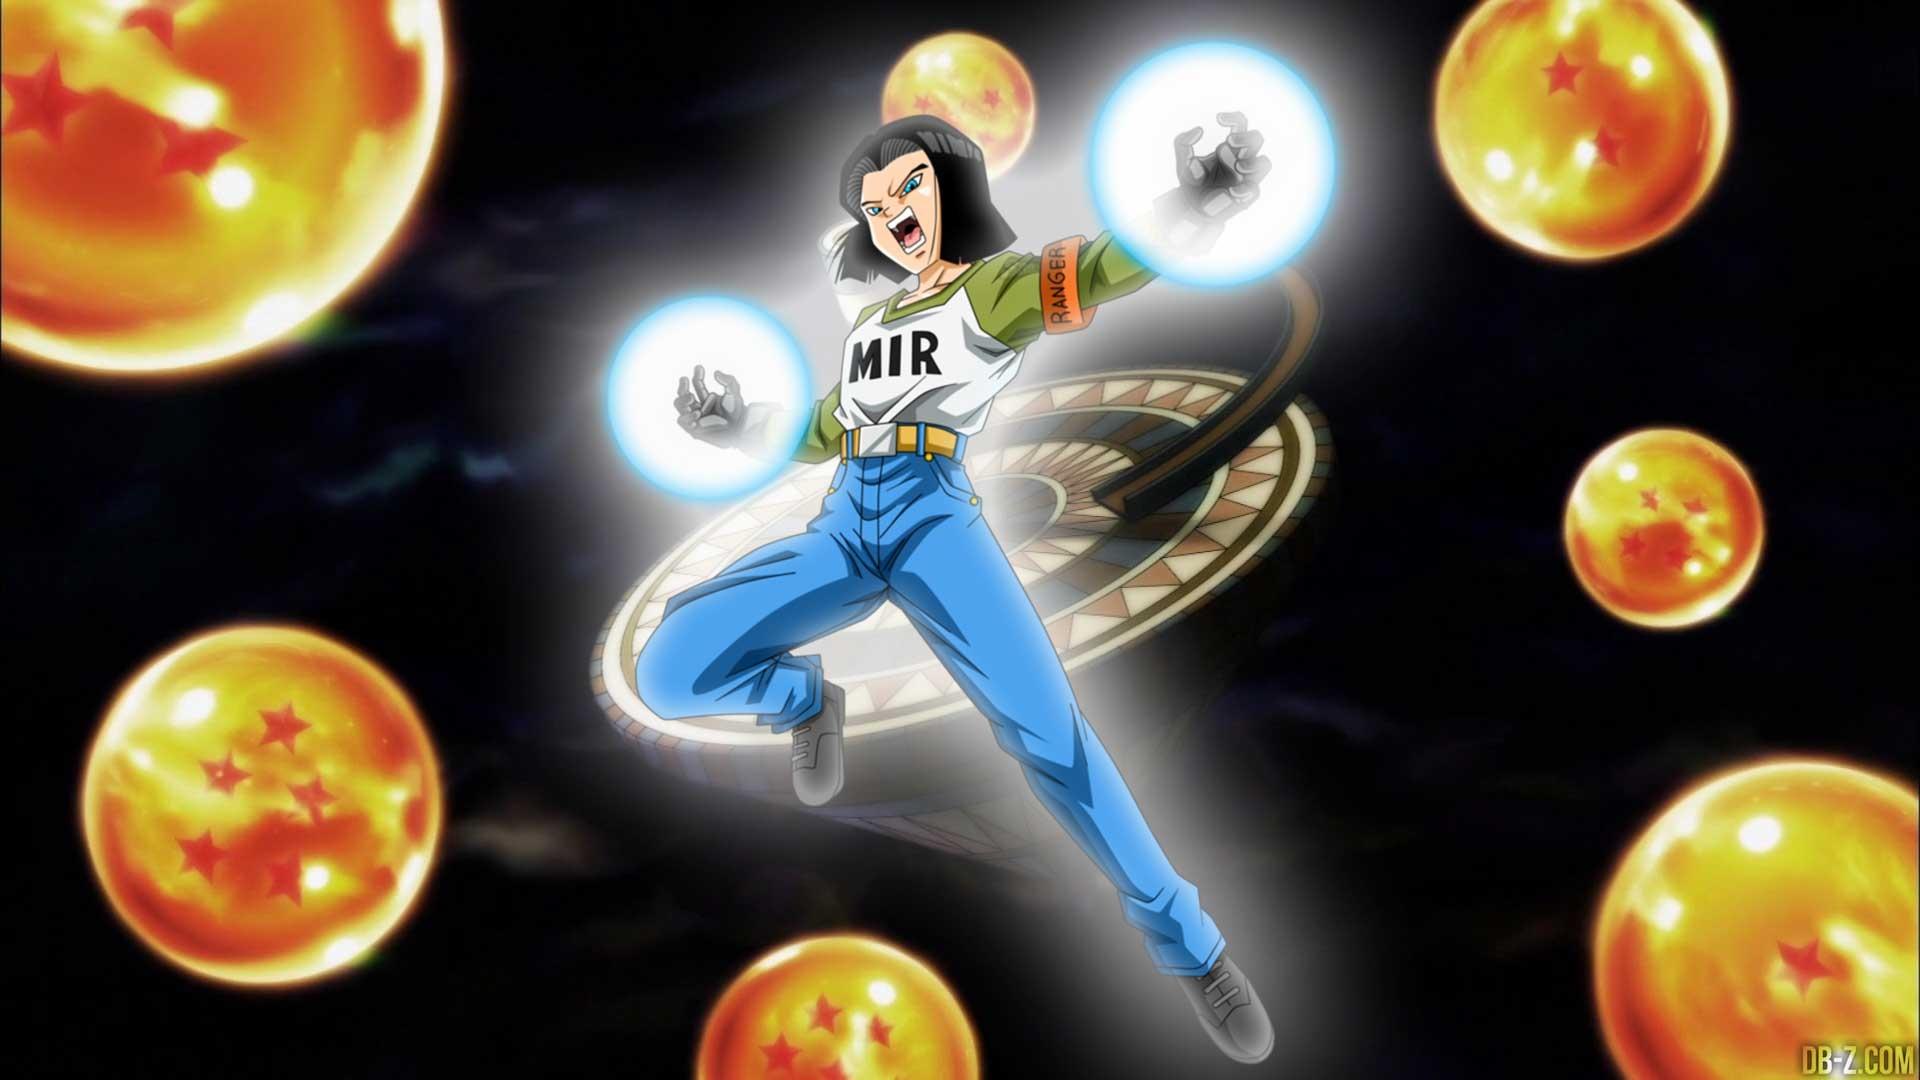 Dragon Ball Super Episode 87 Release Date, Spoilers: The ...